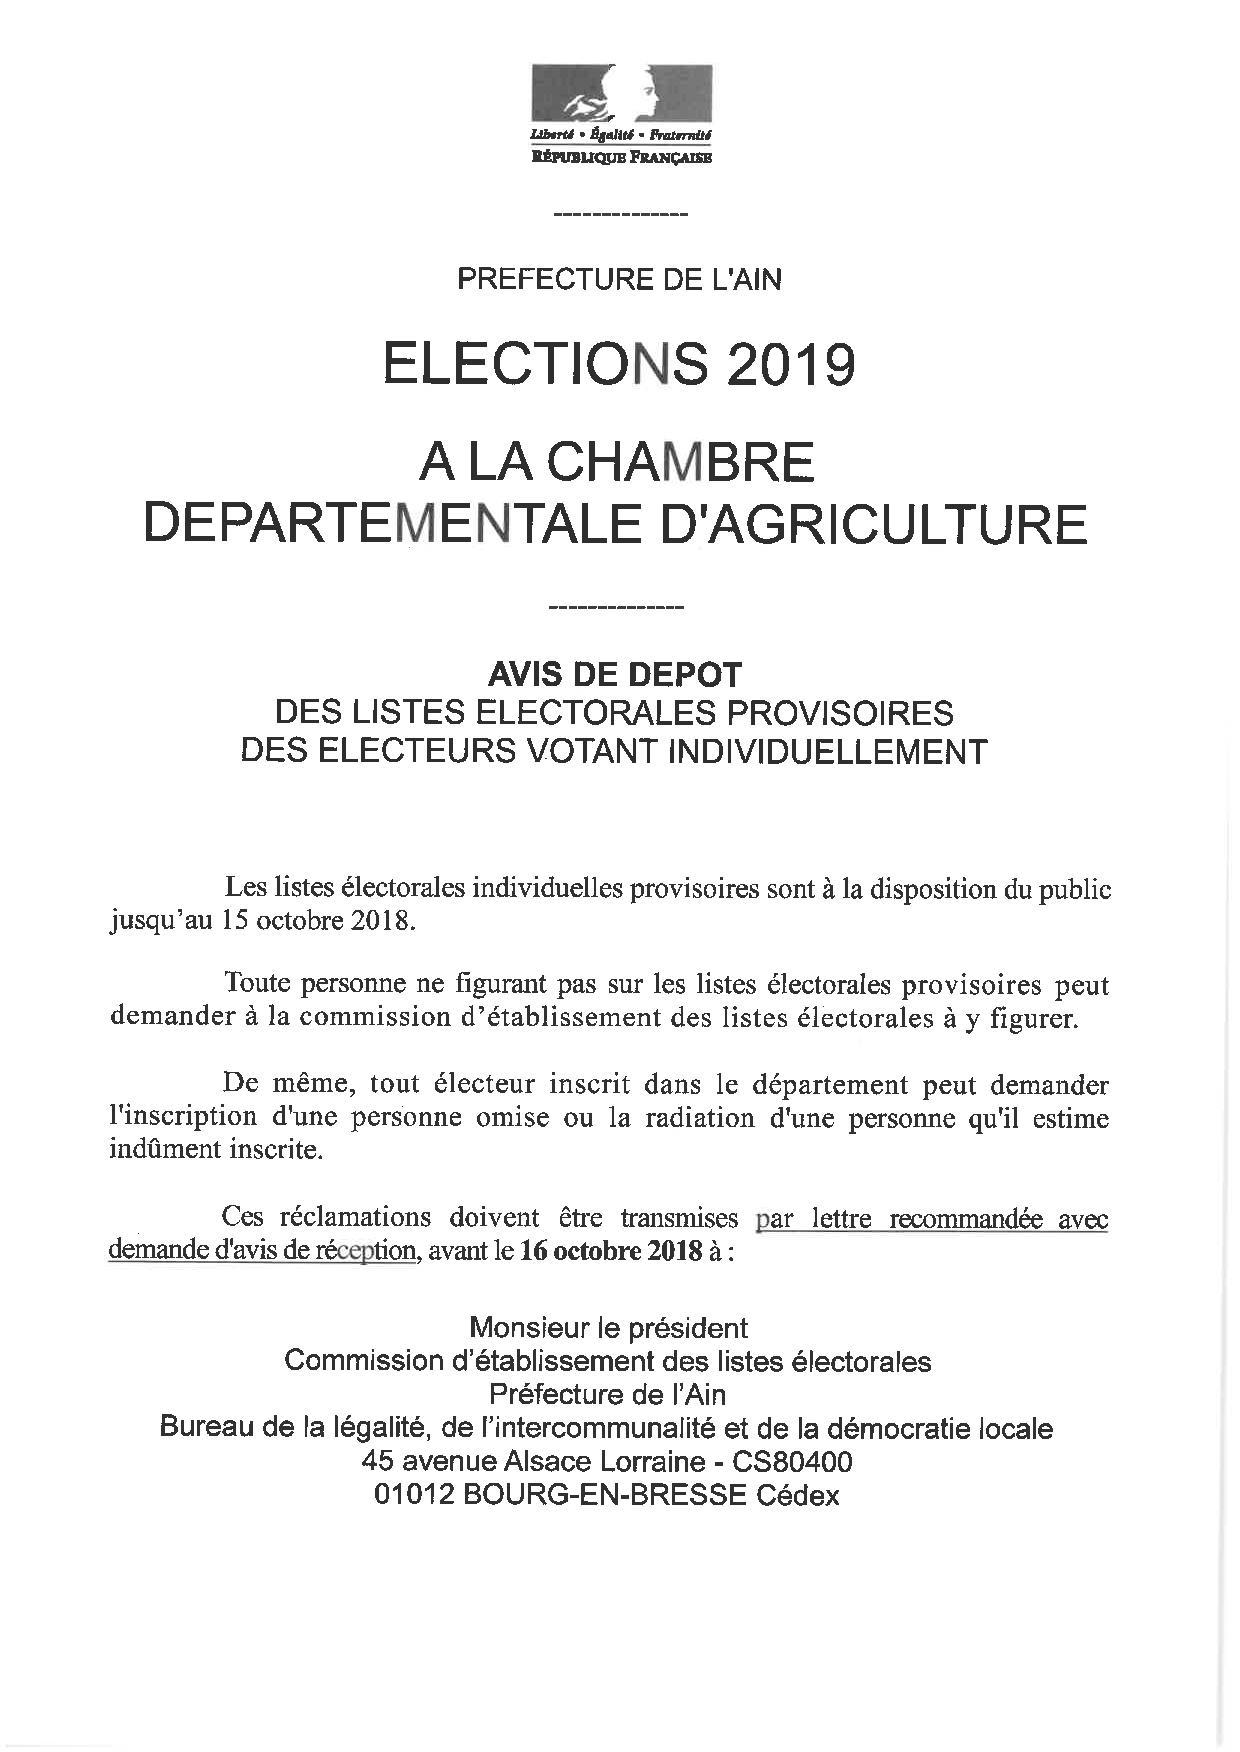 ChambredépartementaledAGRI-page-001(1)